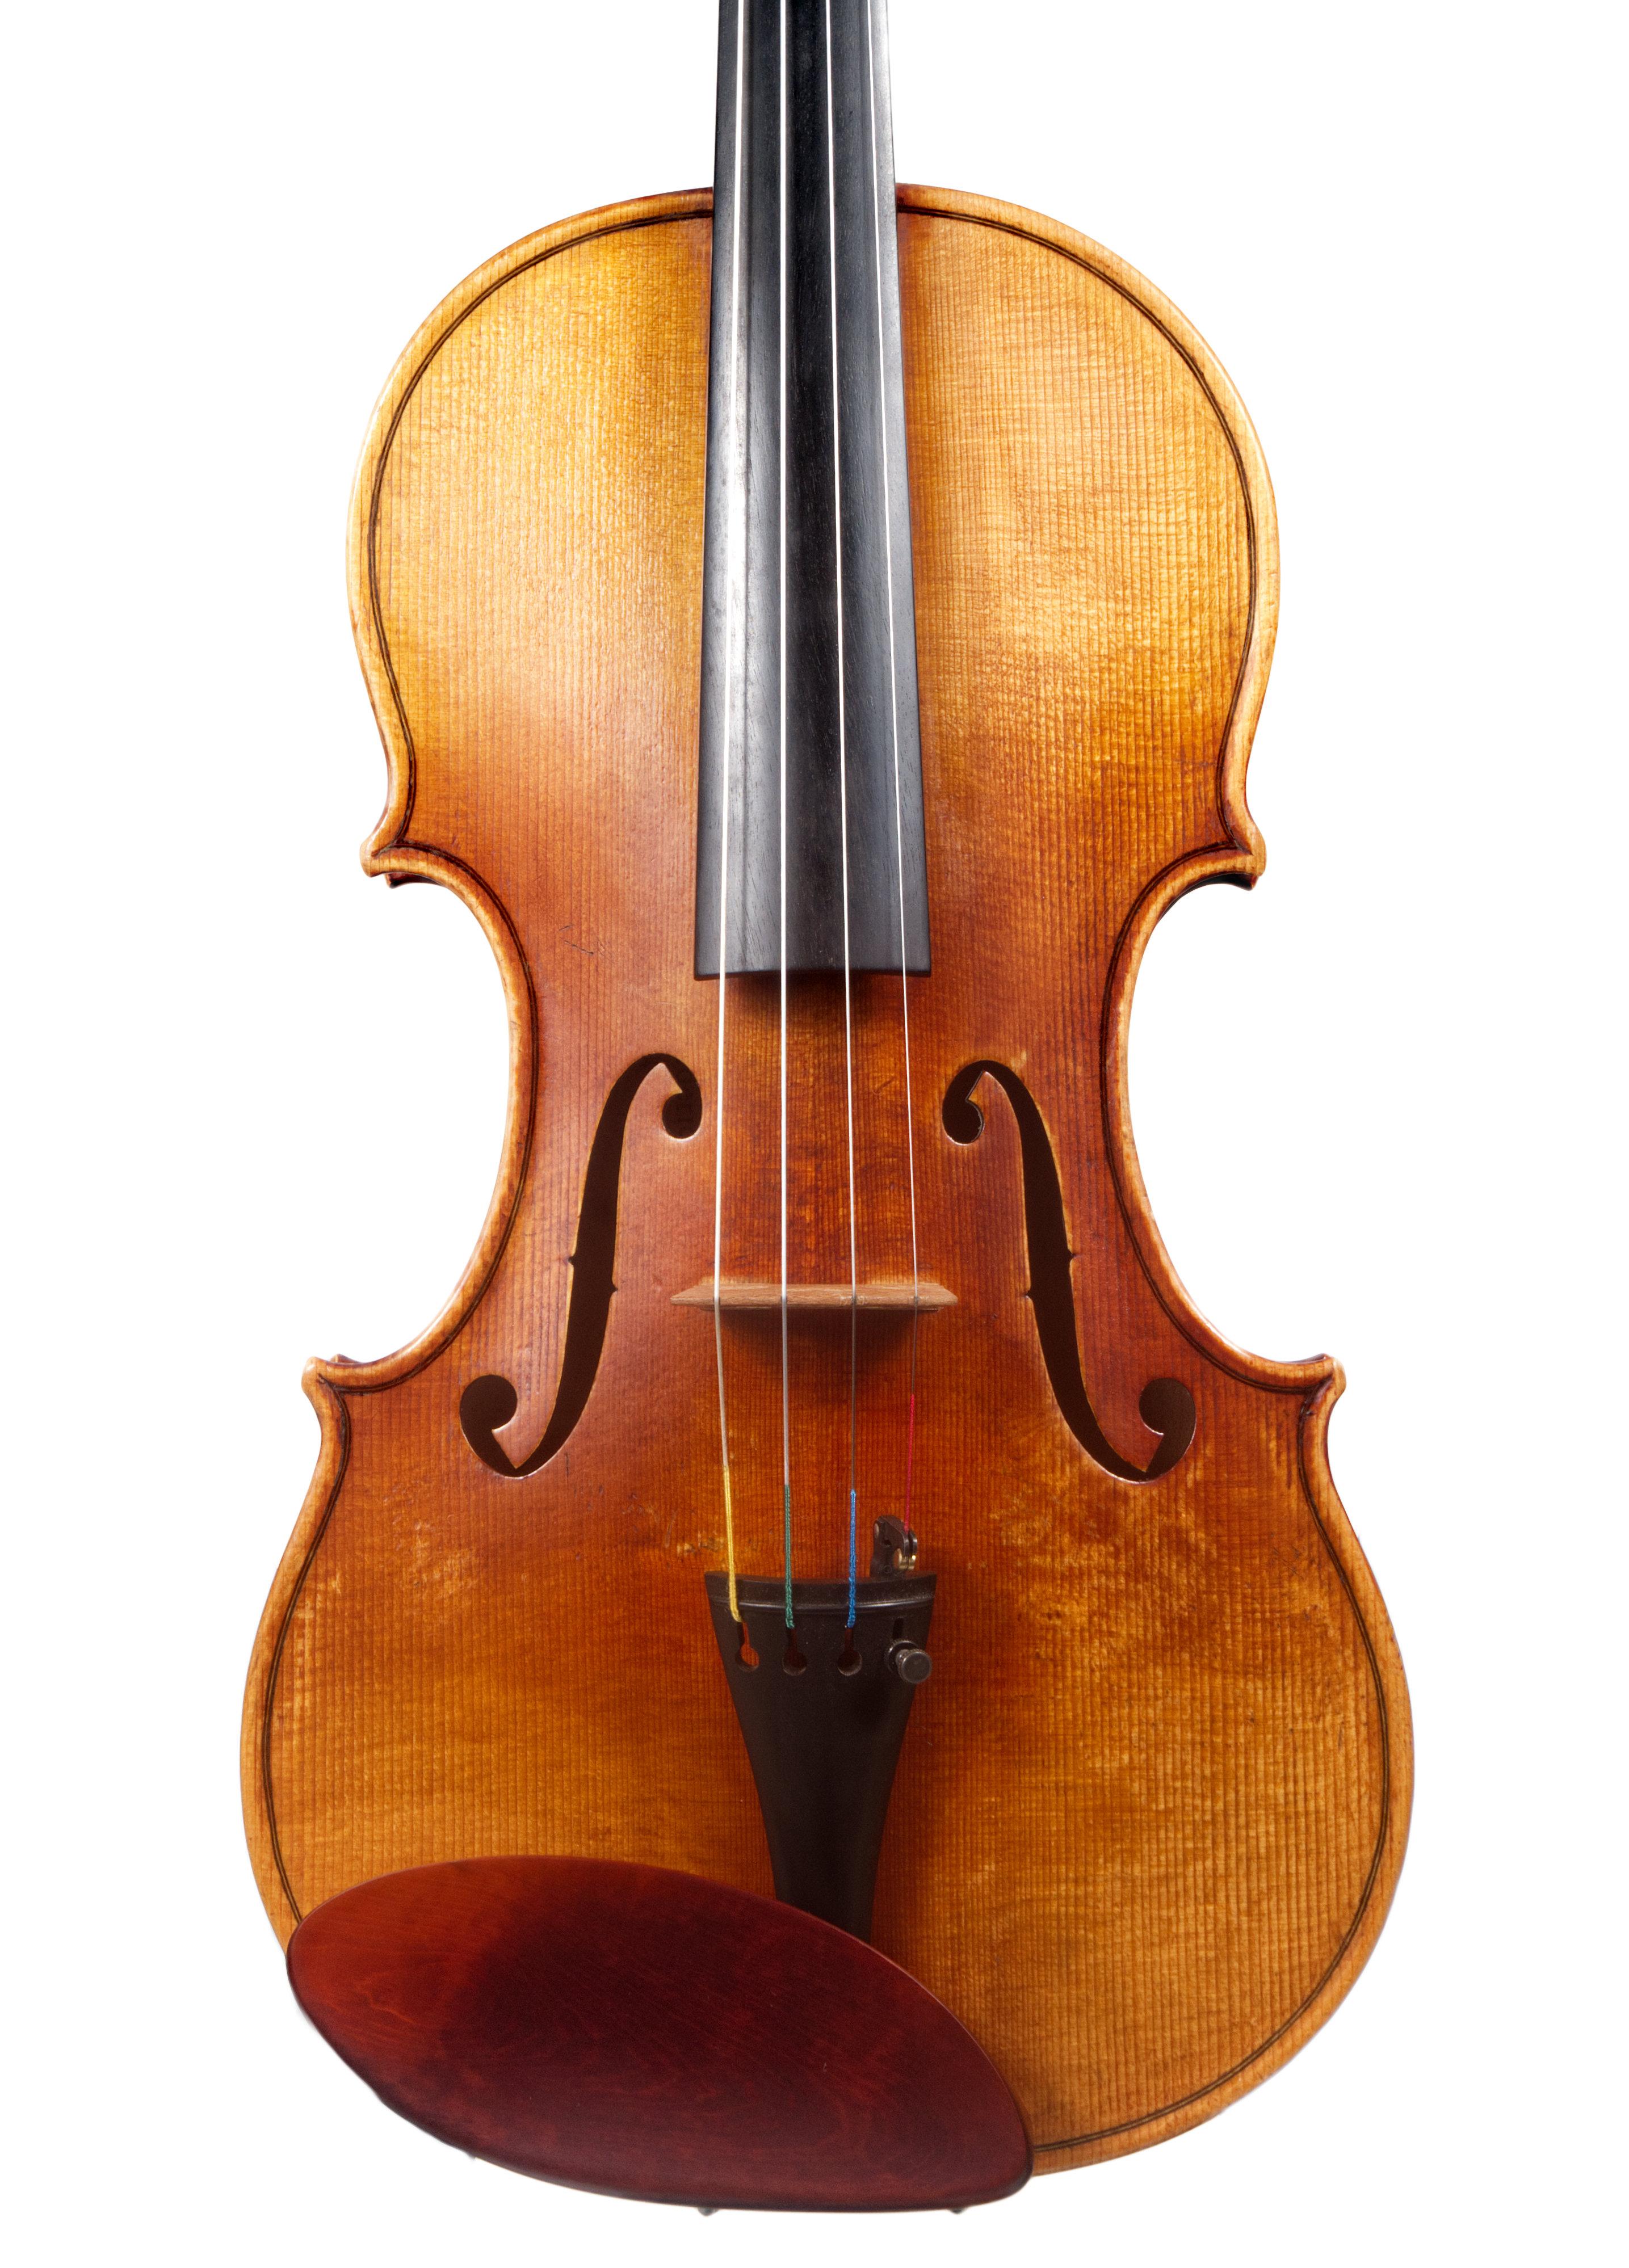 Violin by Frédéric Chaudière, 2016